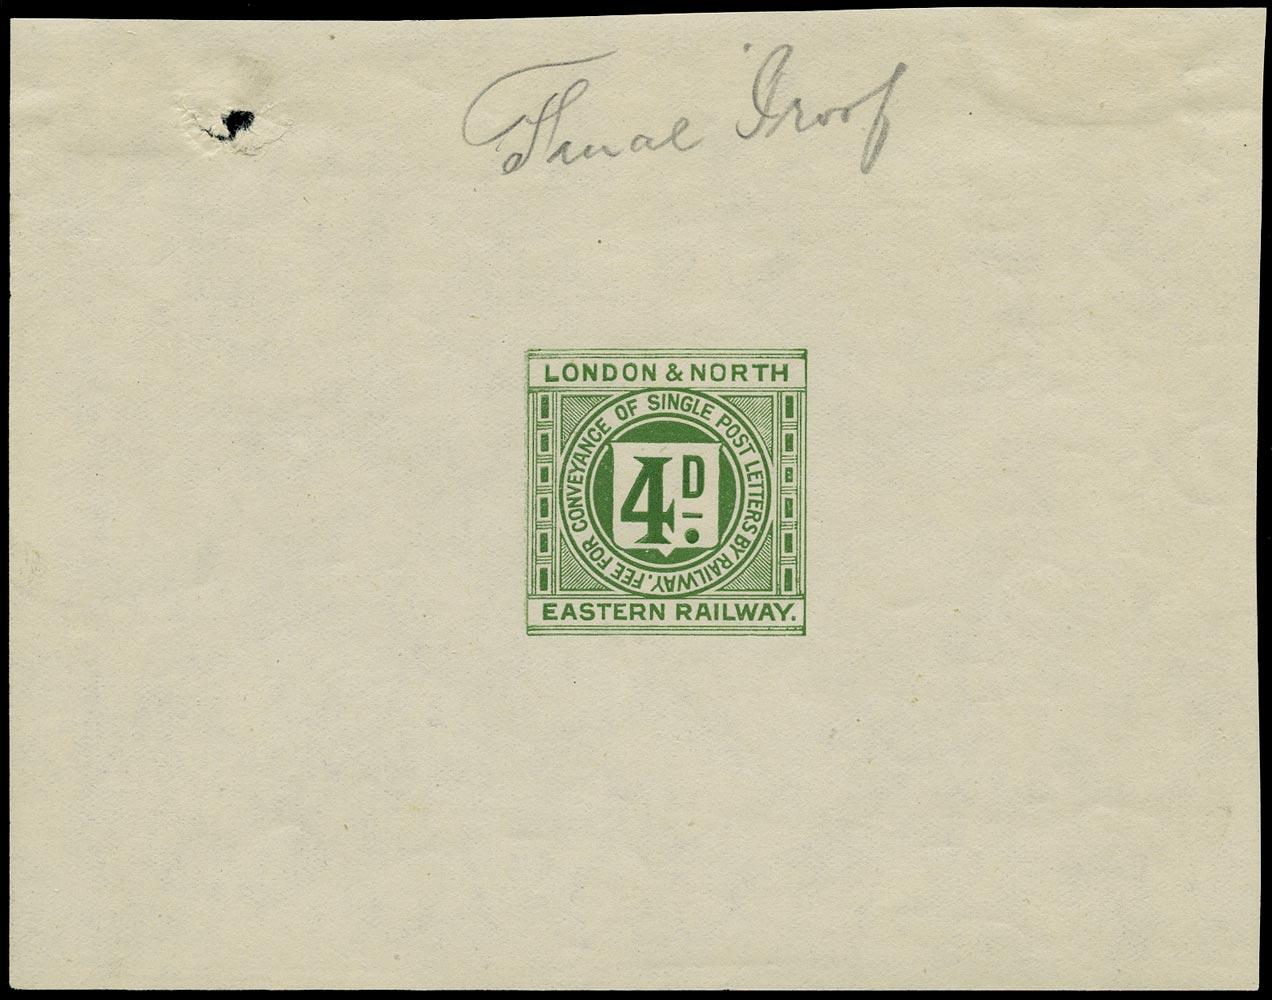 GB 1924 Railway - 4d Railway letter stamp proof